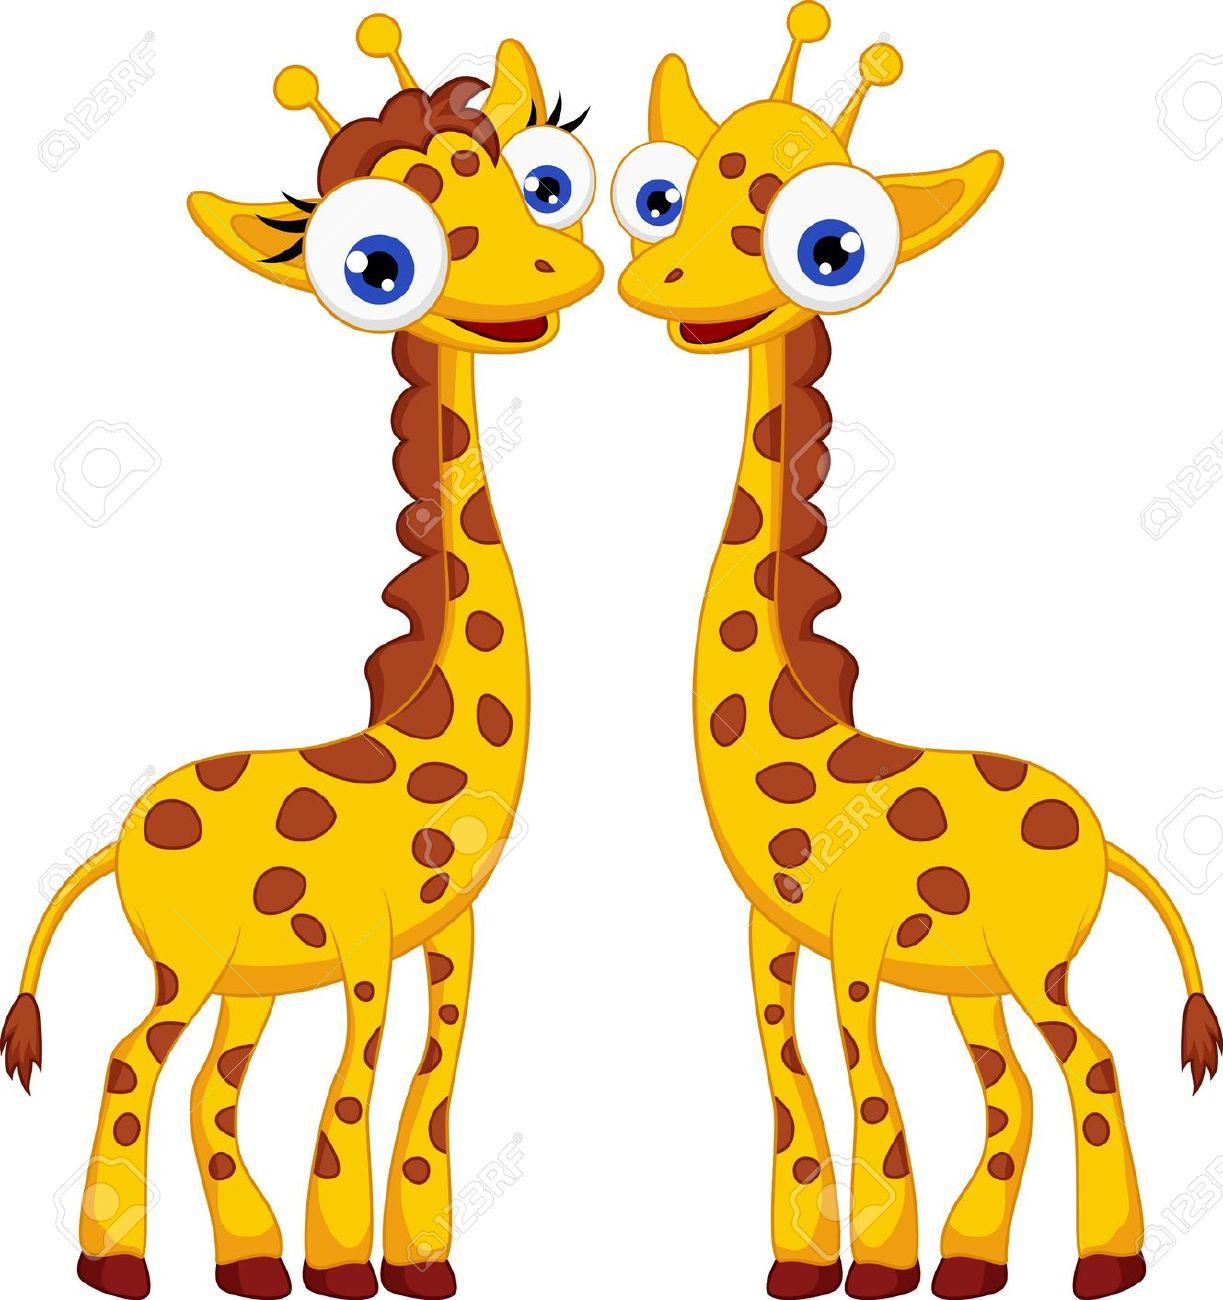 K.o.p.e.l. clipart giraffe Clipart Vector Illustration Free Free